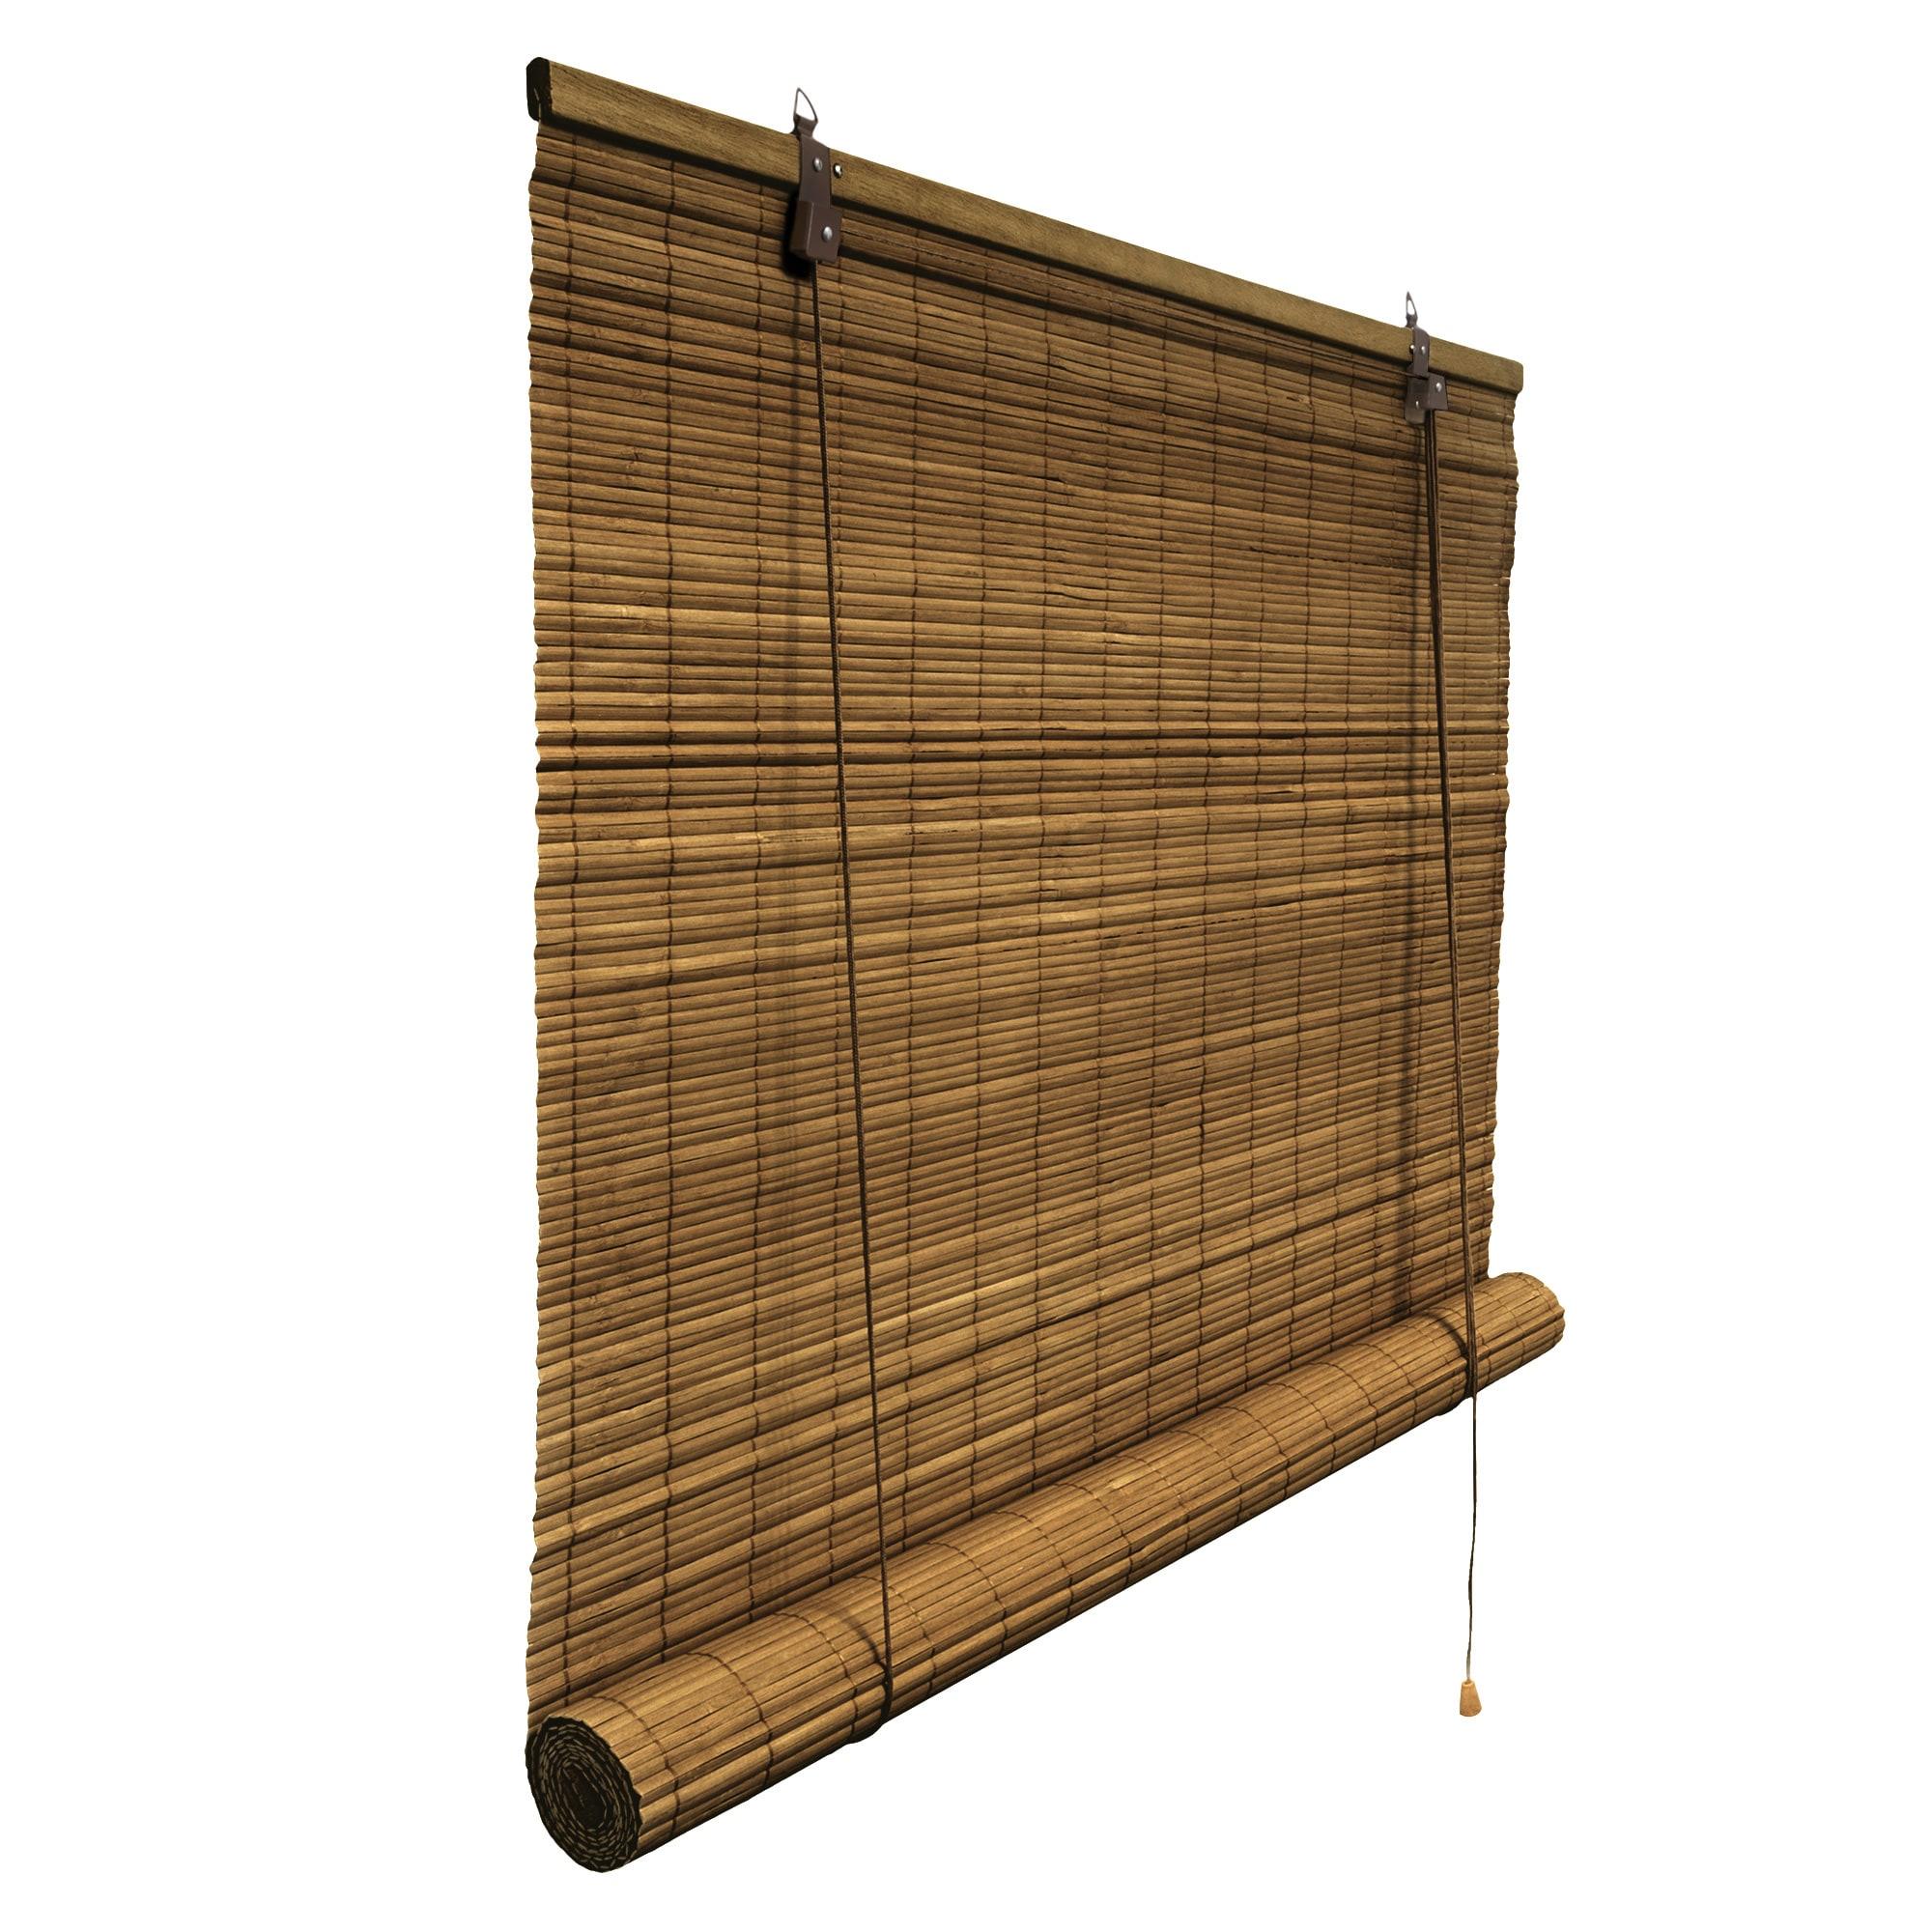 Bambusrollo Rollo Bambus Jalousie Vorhang Bambus Seitenzug Schnurzug Holzrollo  eBay